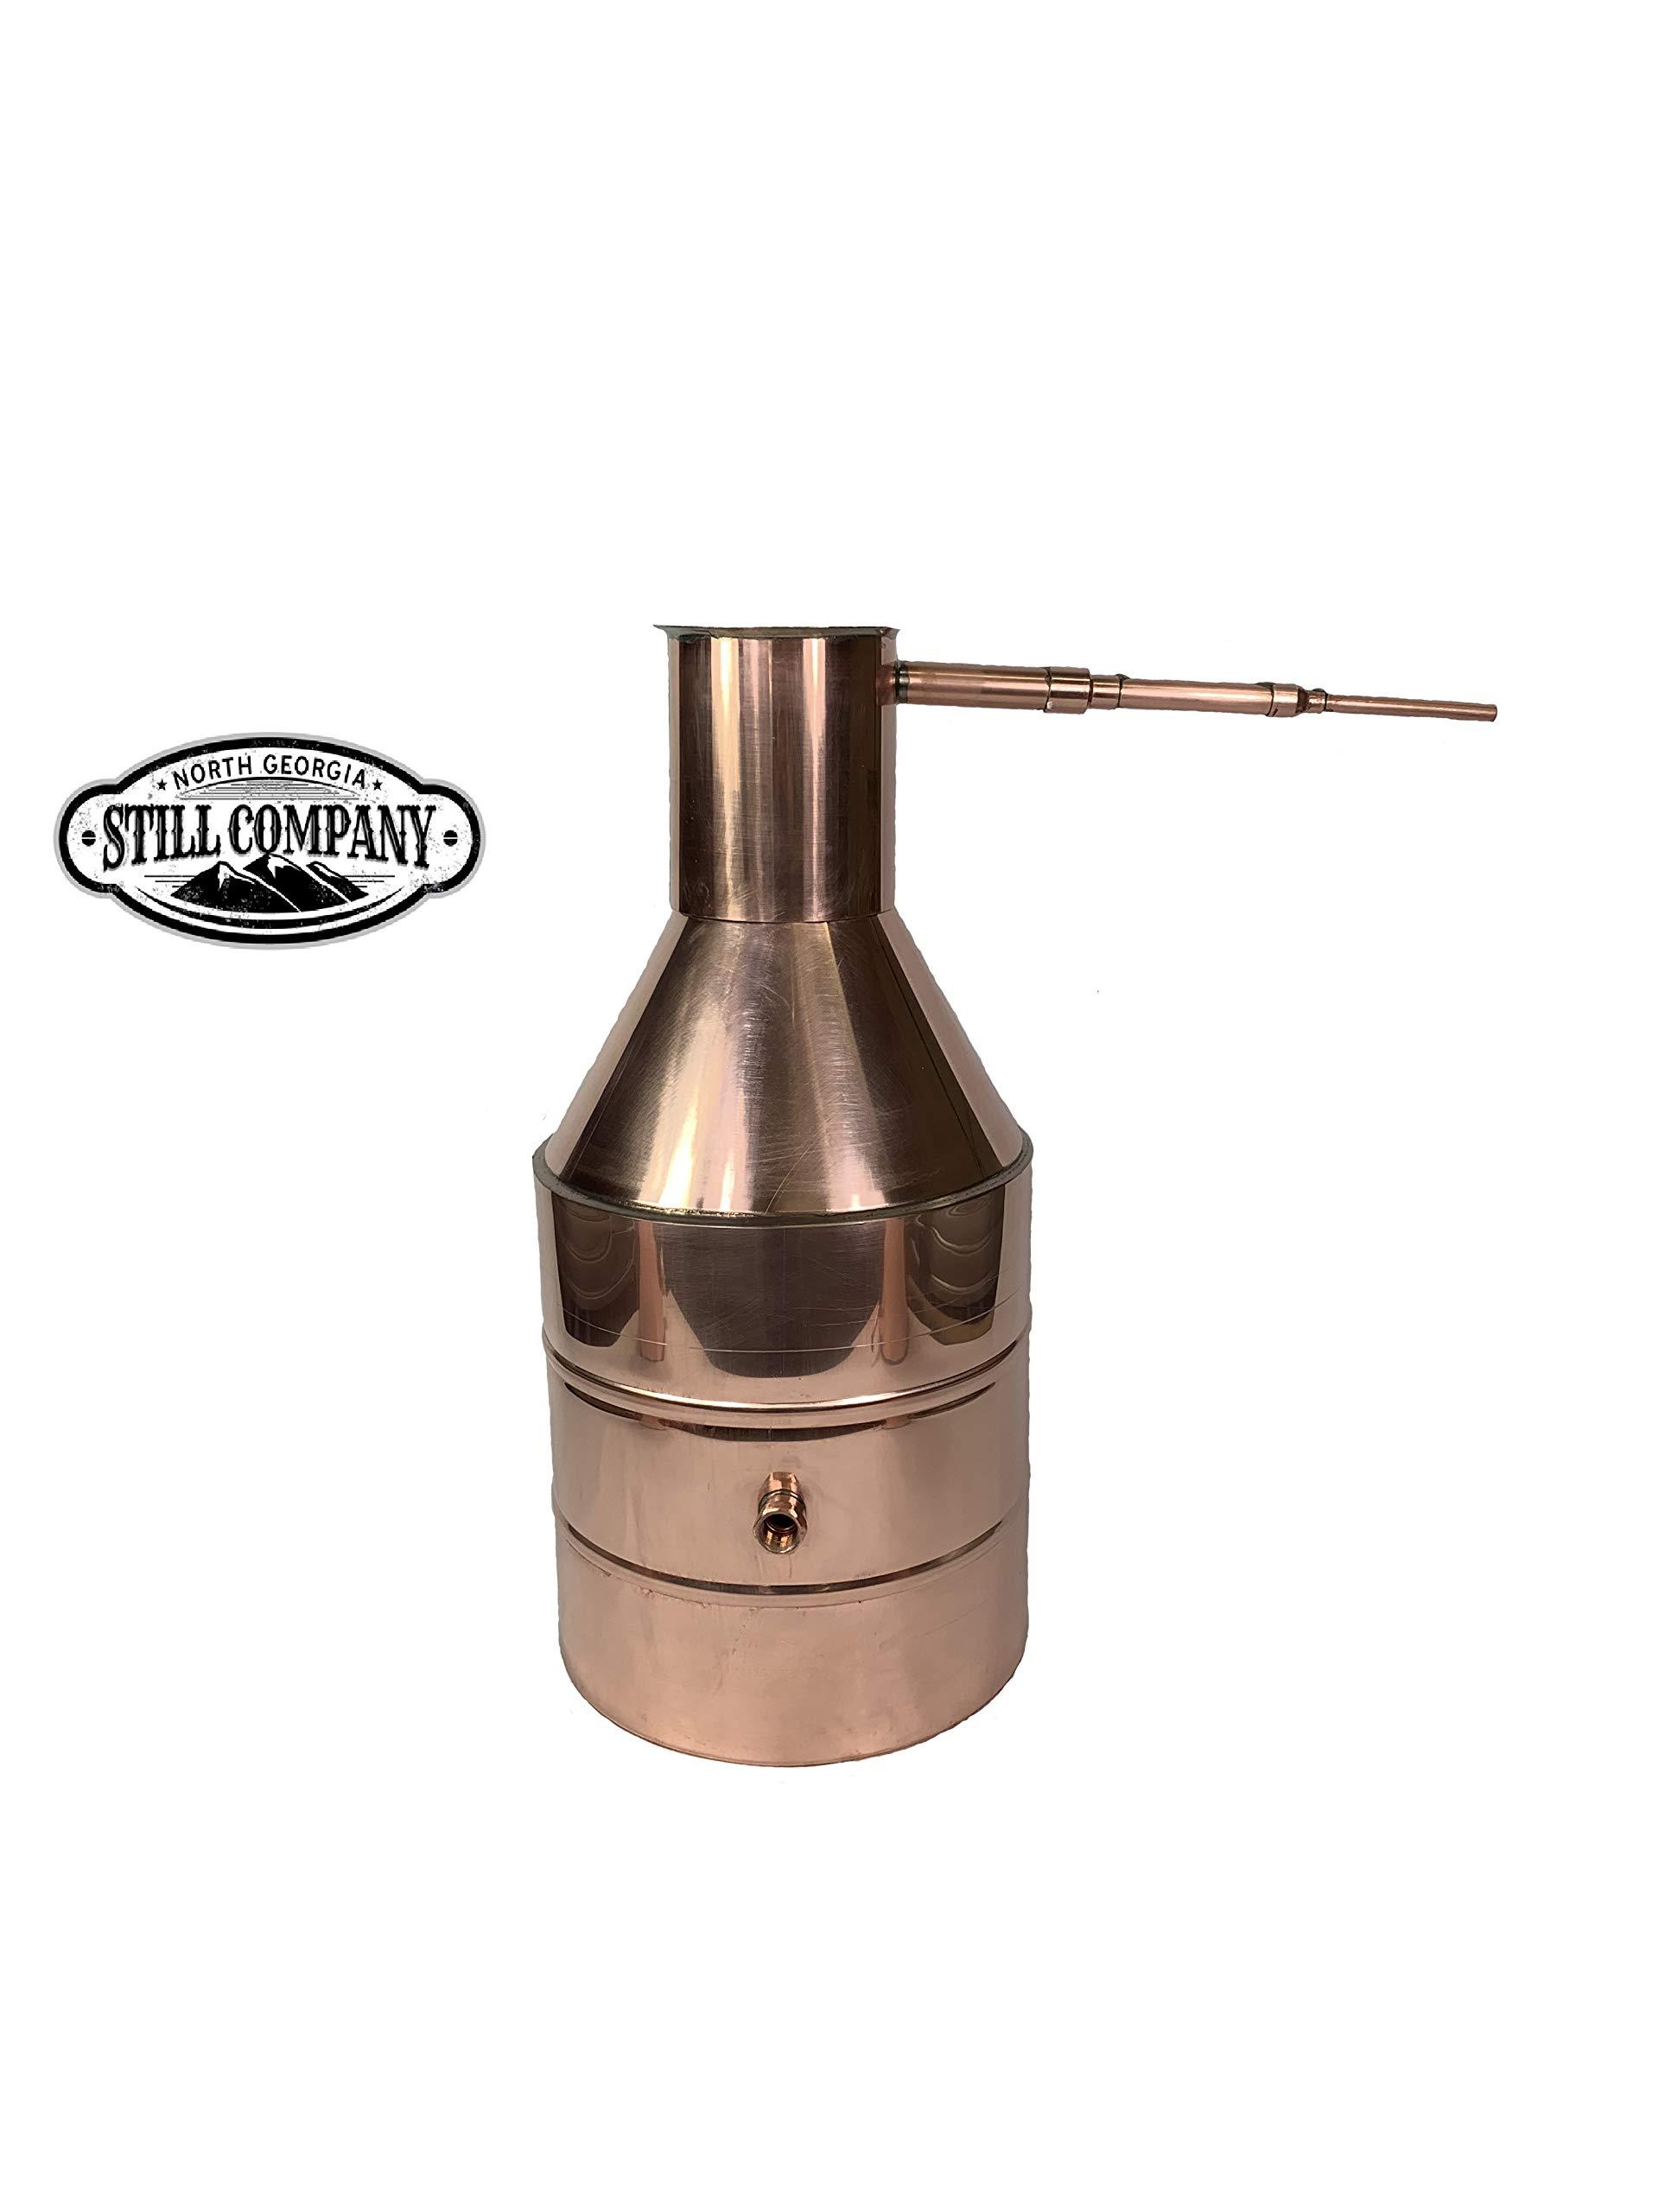 5 Gallon Copper Moonshine Whiskey & Brandy Still by North Georgia Still Company